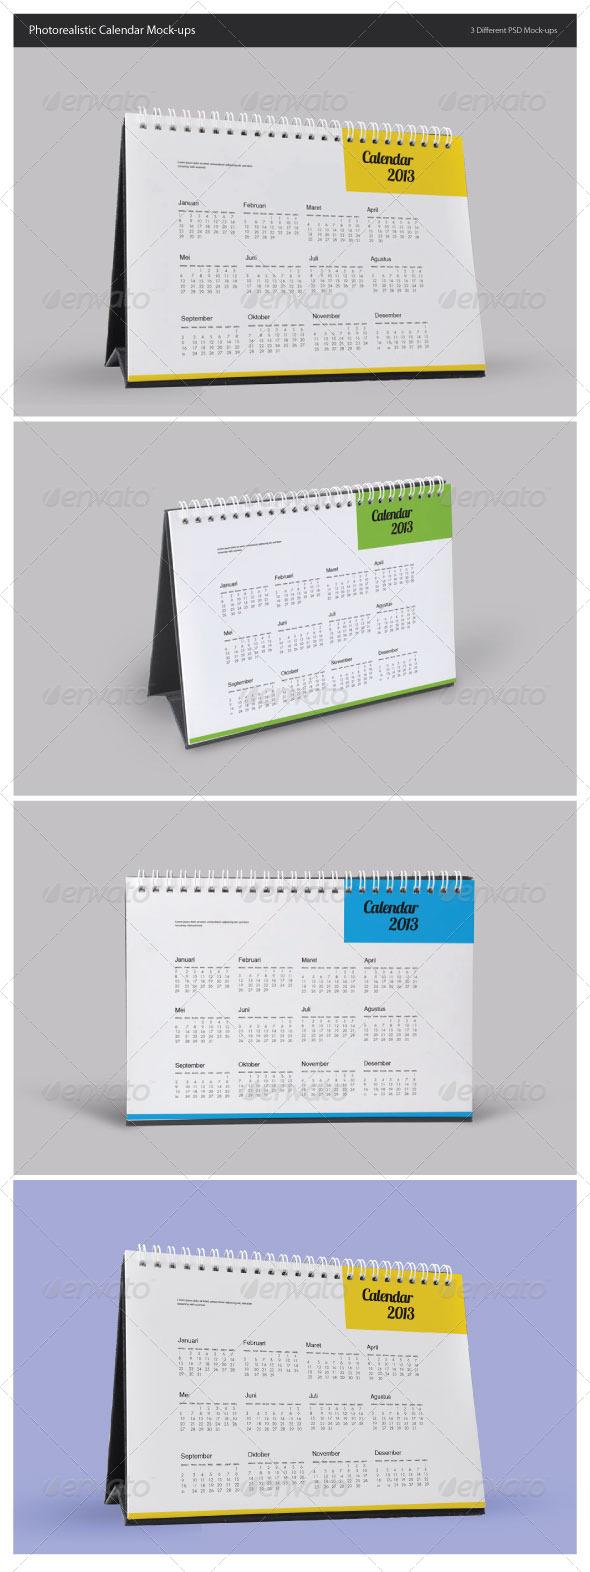 Photorealistic Calendar Mock-Ups - Miscellaneous Print